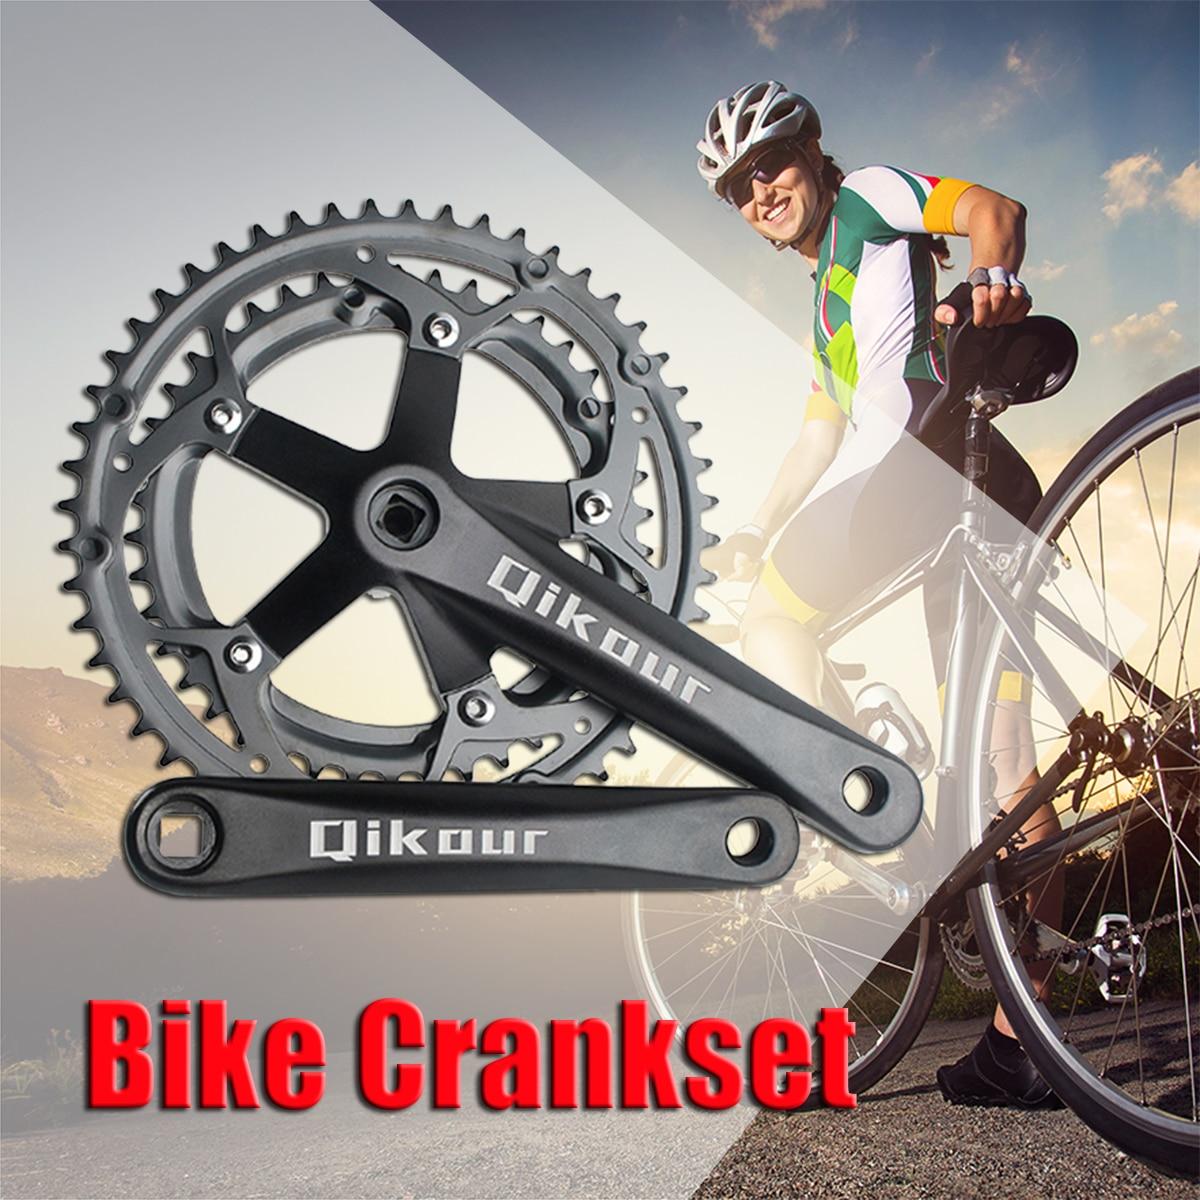 цена на Aluminum 52/42T Mountain Bicycle Crankset For BMX/Folding Bike 2x9/10S Crankset with Chainring Crankset Road Bike